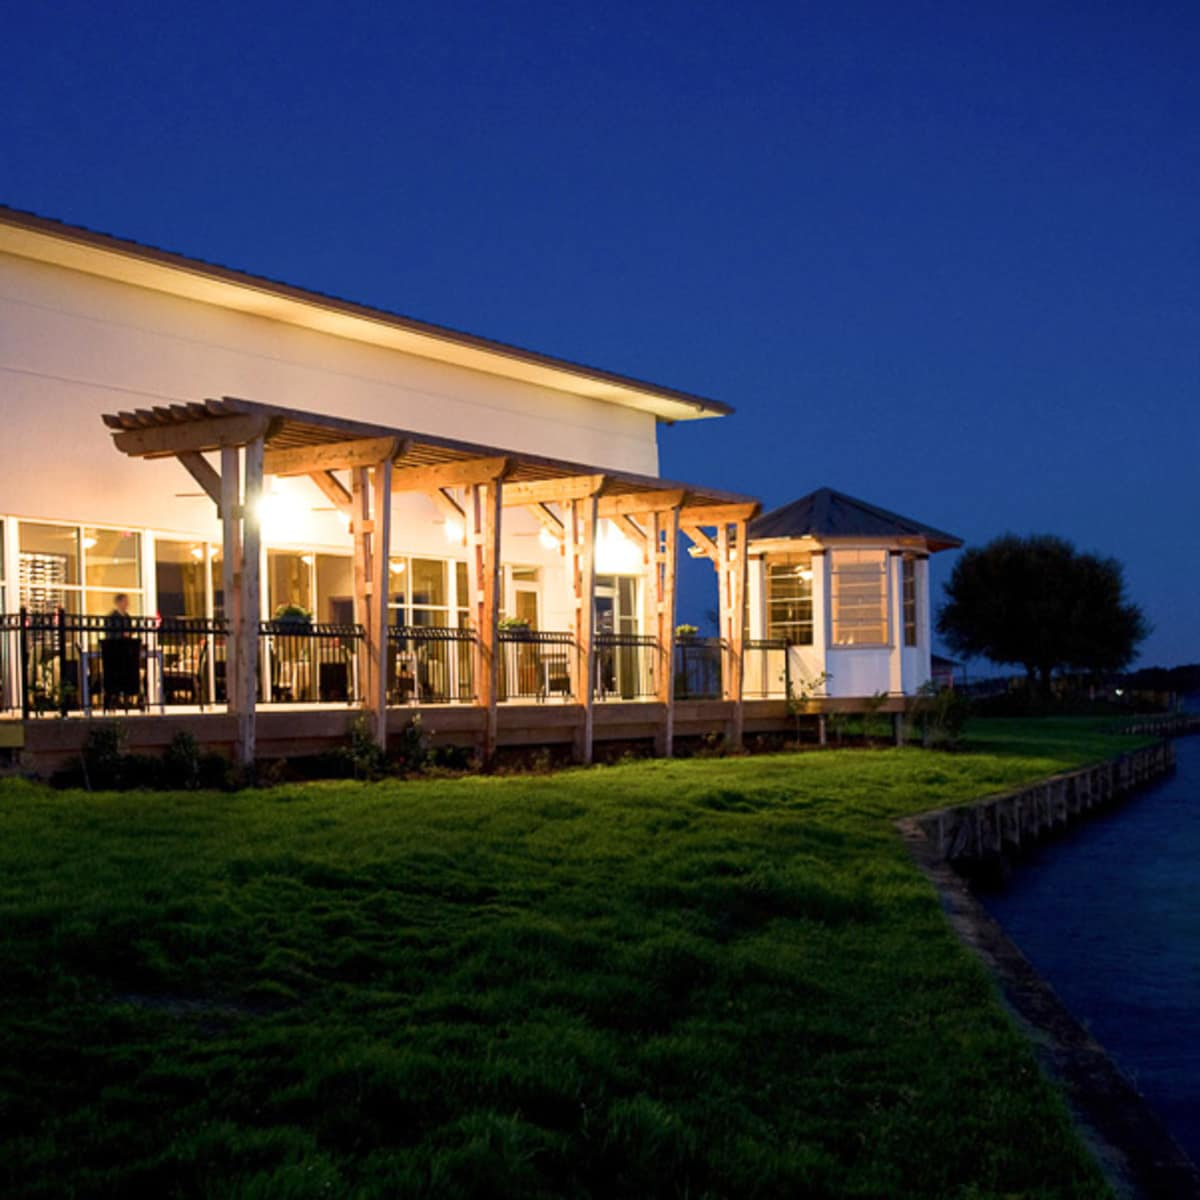 Places-Hotels/Spas-Chez Roux at La Torretta del Lago Resort